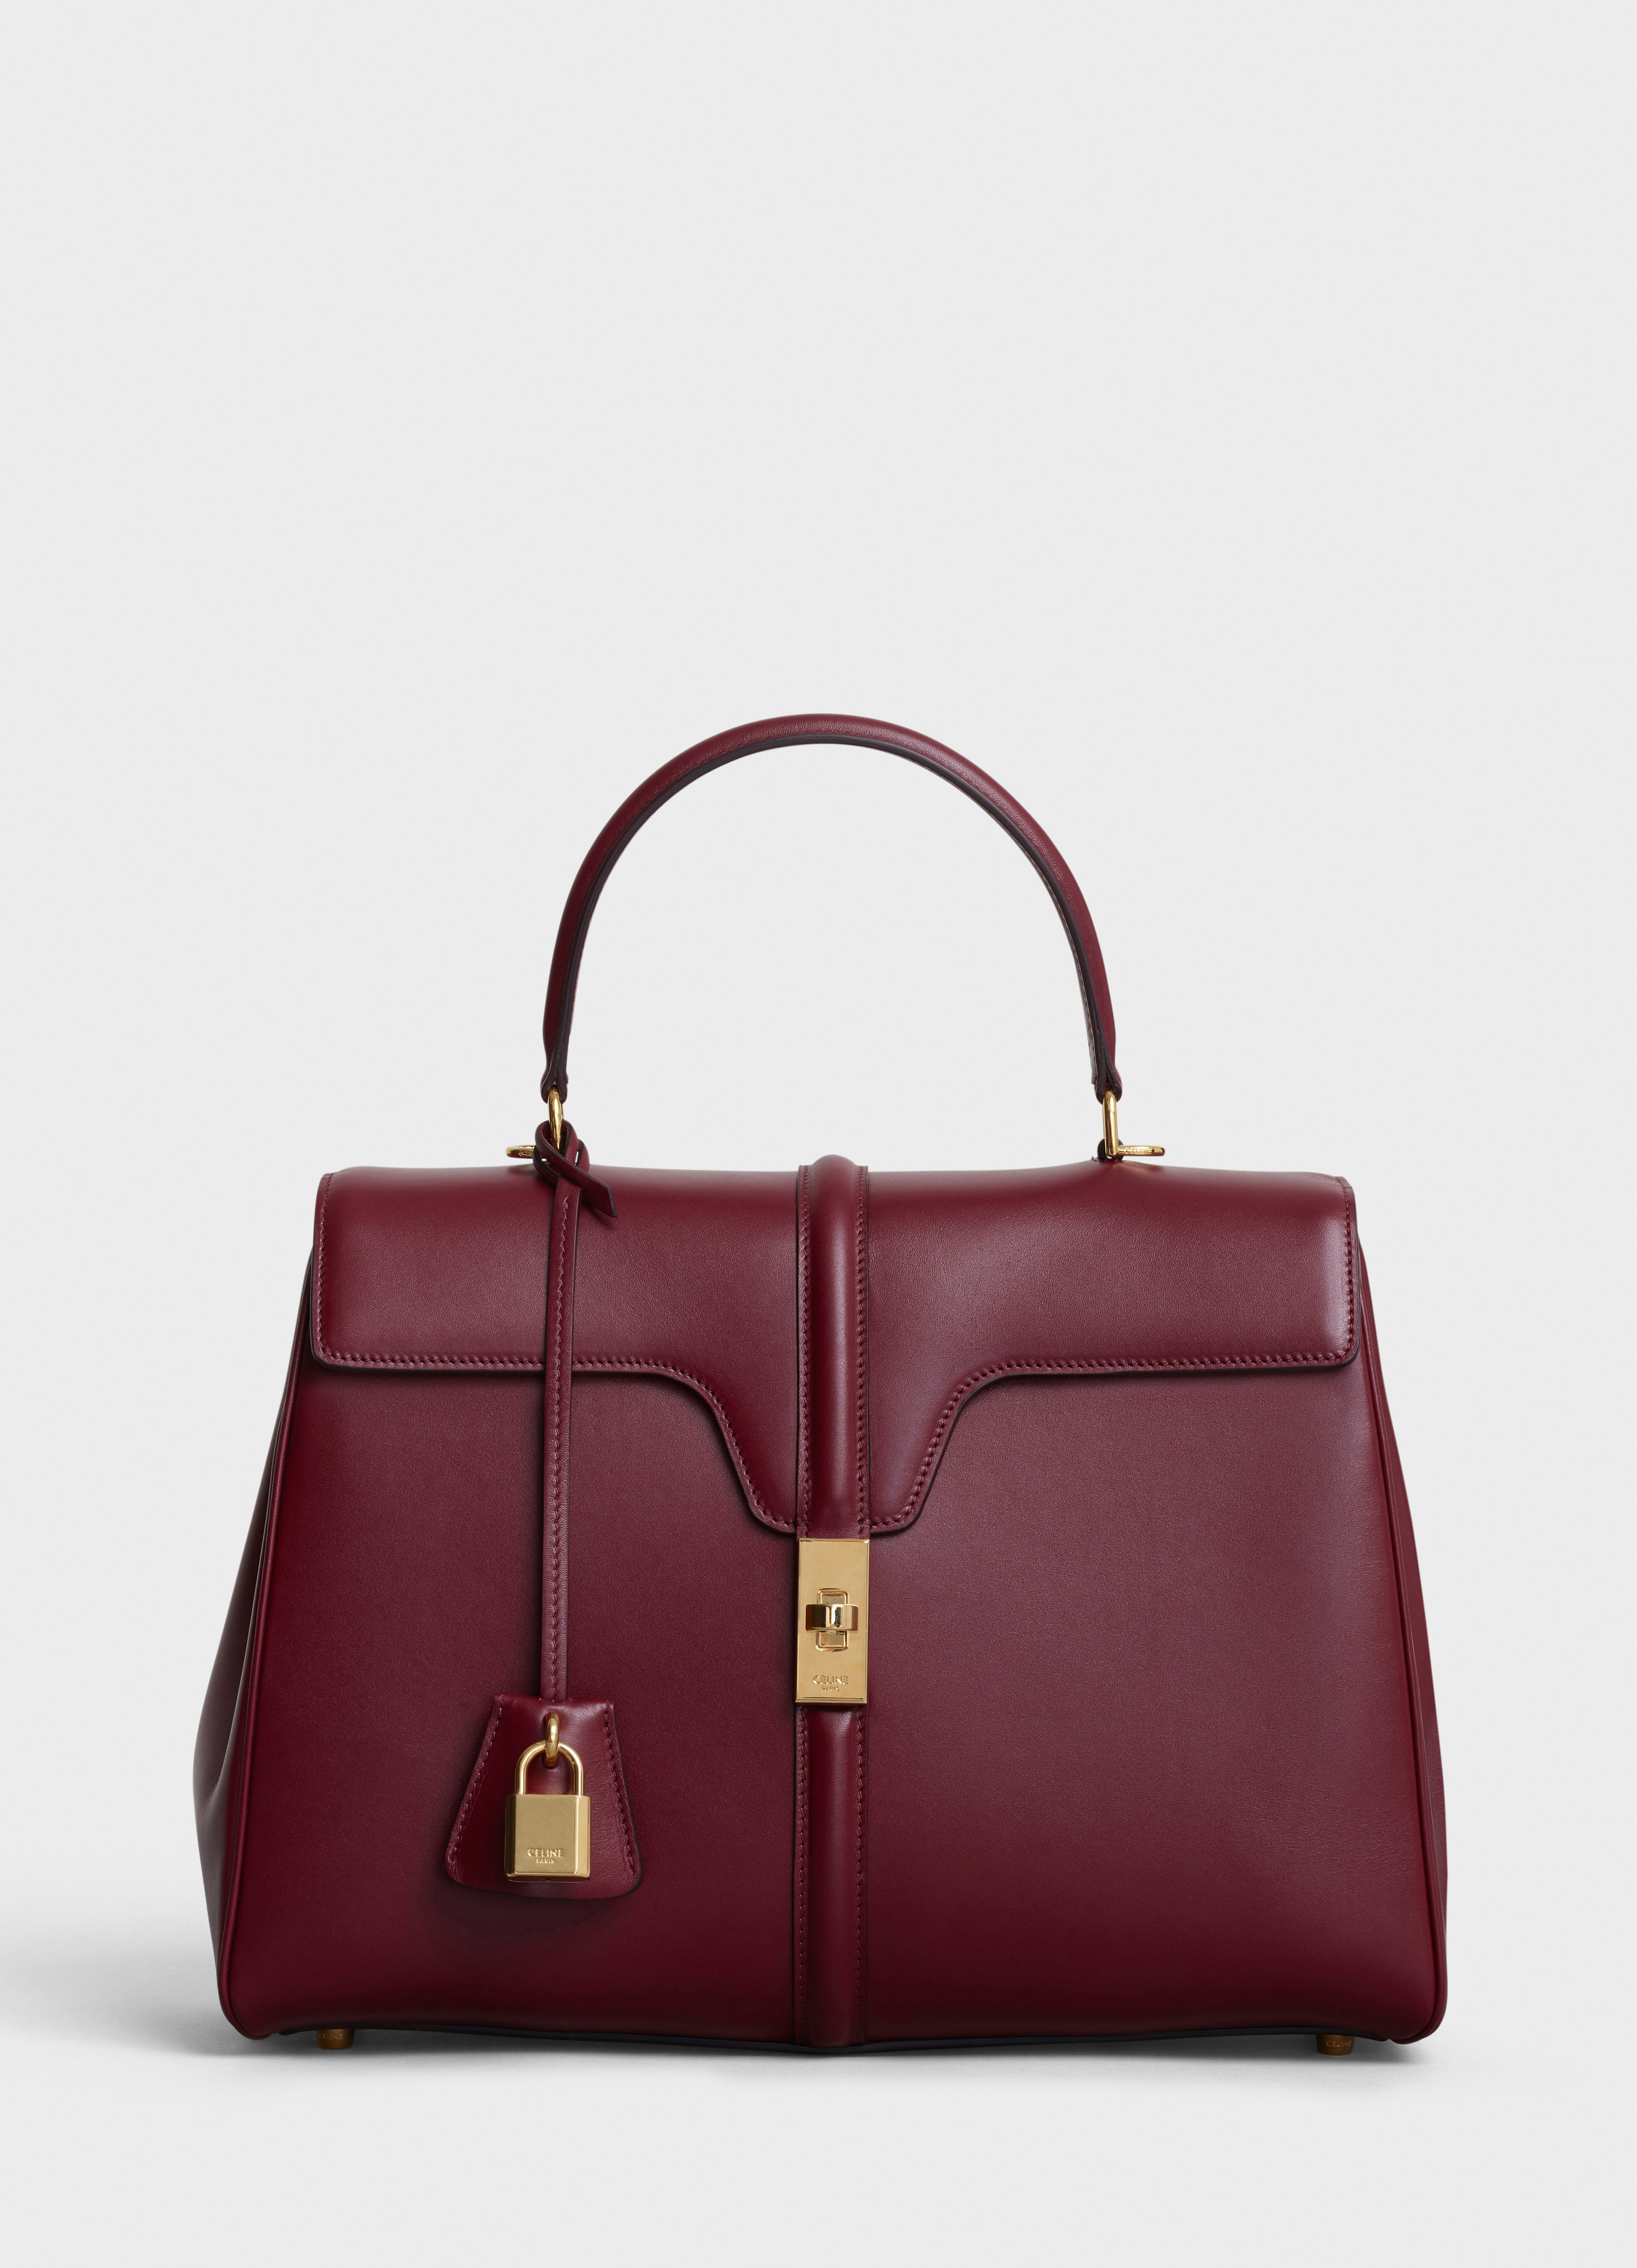 f07f5be9355 Celine Bags 2019